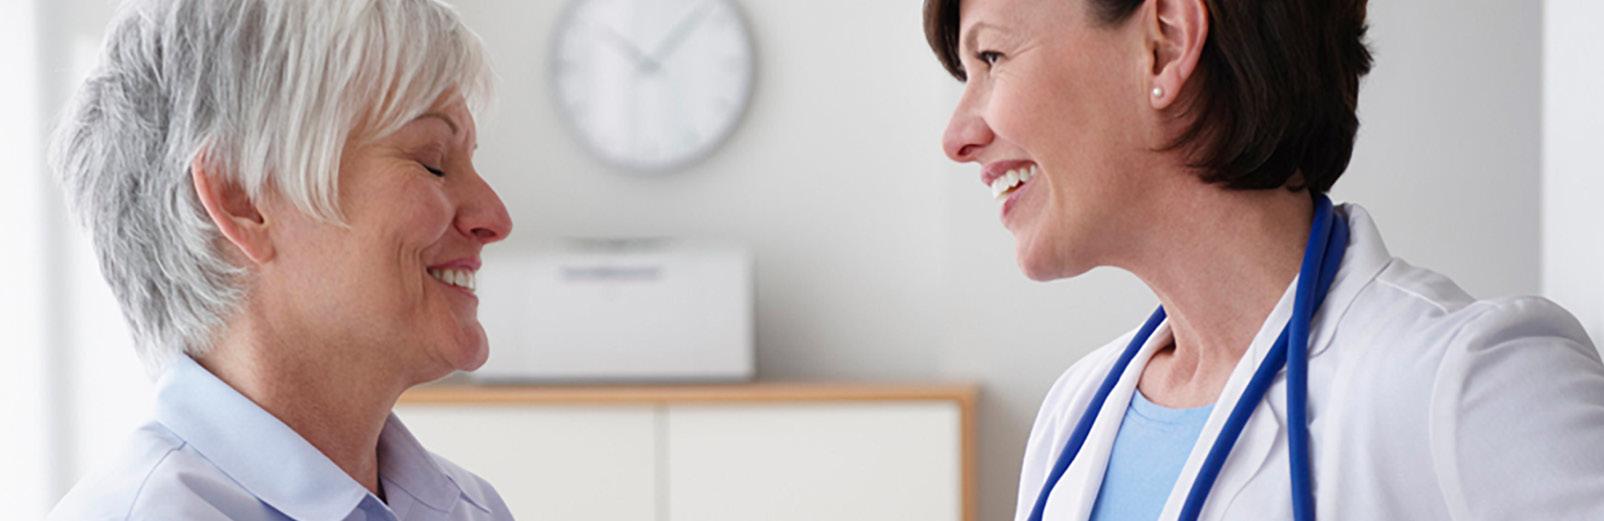 como conseguir pacientes particulares